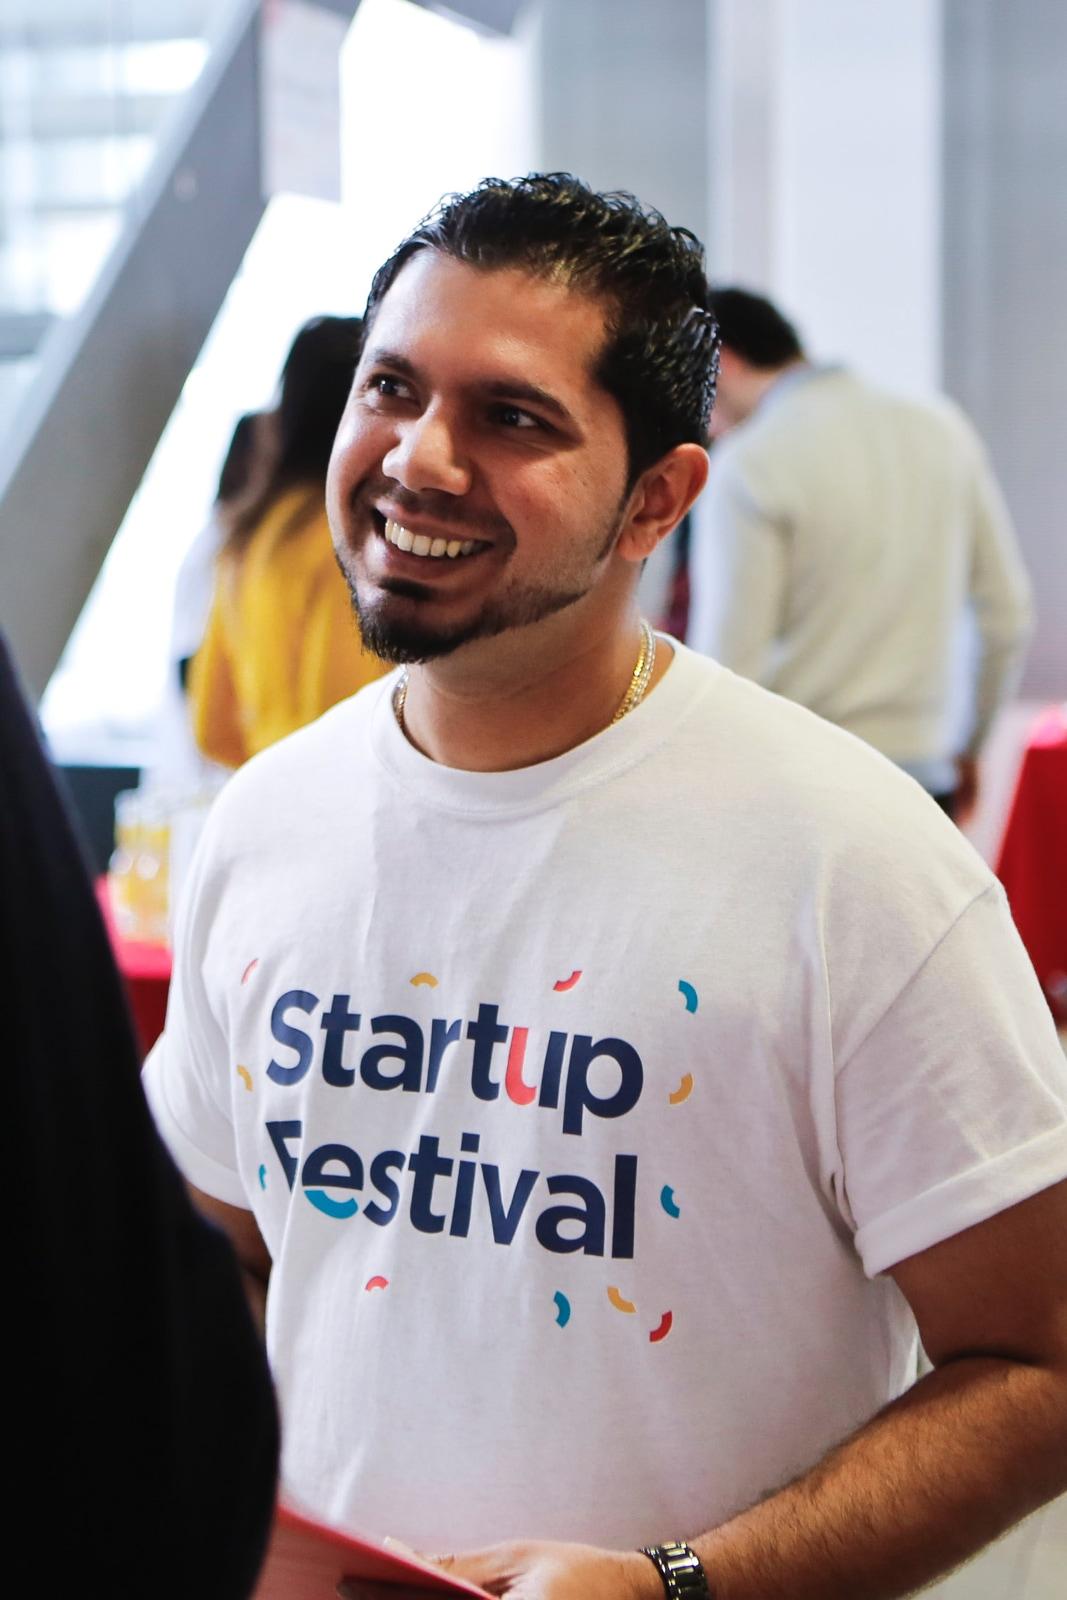 Startup Festival attendee